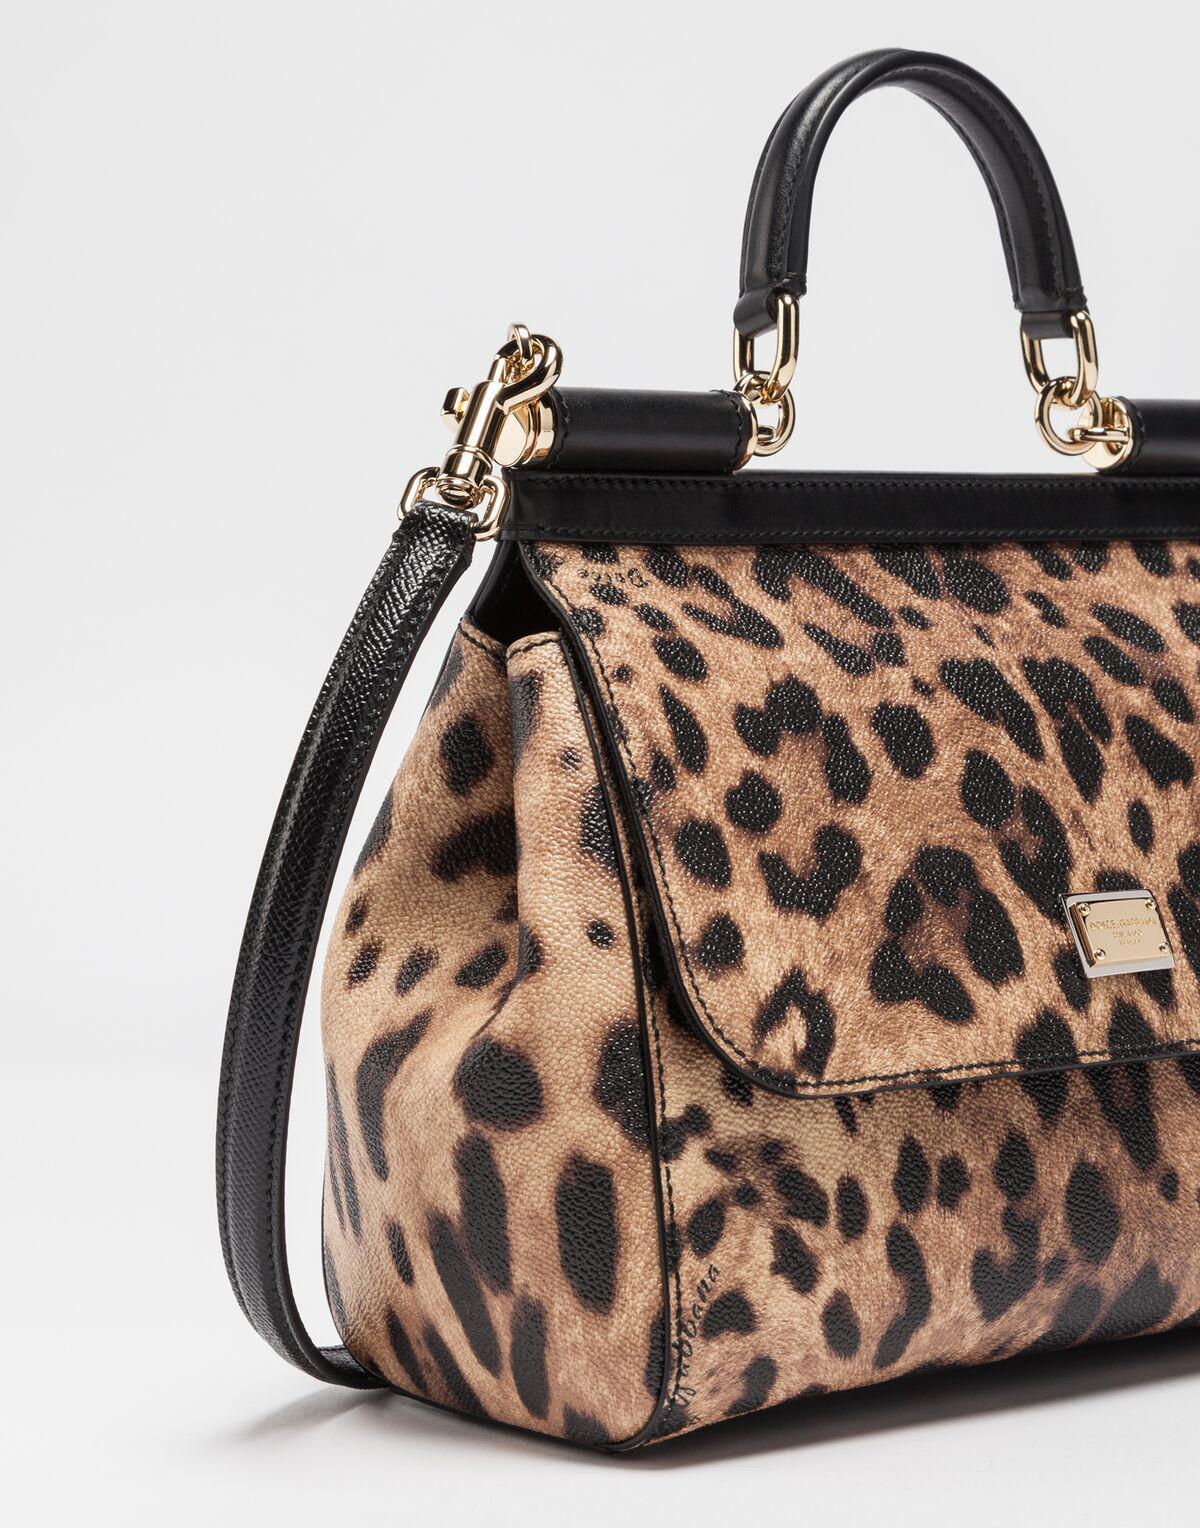 Lyst - Dolce   Gabbana Medium Sicily Handbag In Dauphine Leather in Brown 5cff14e8cd